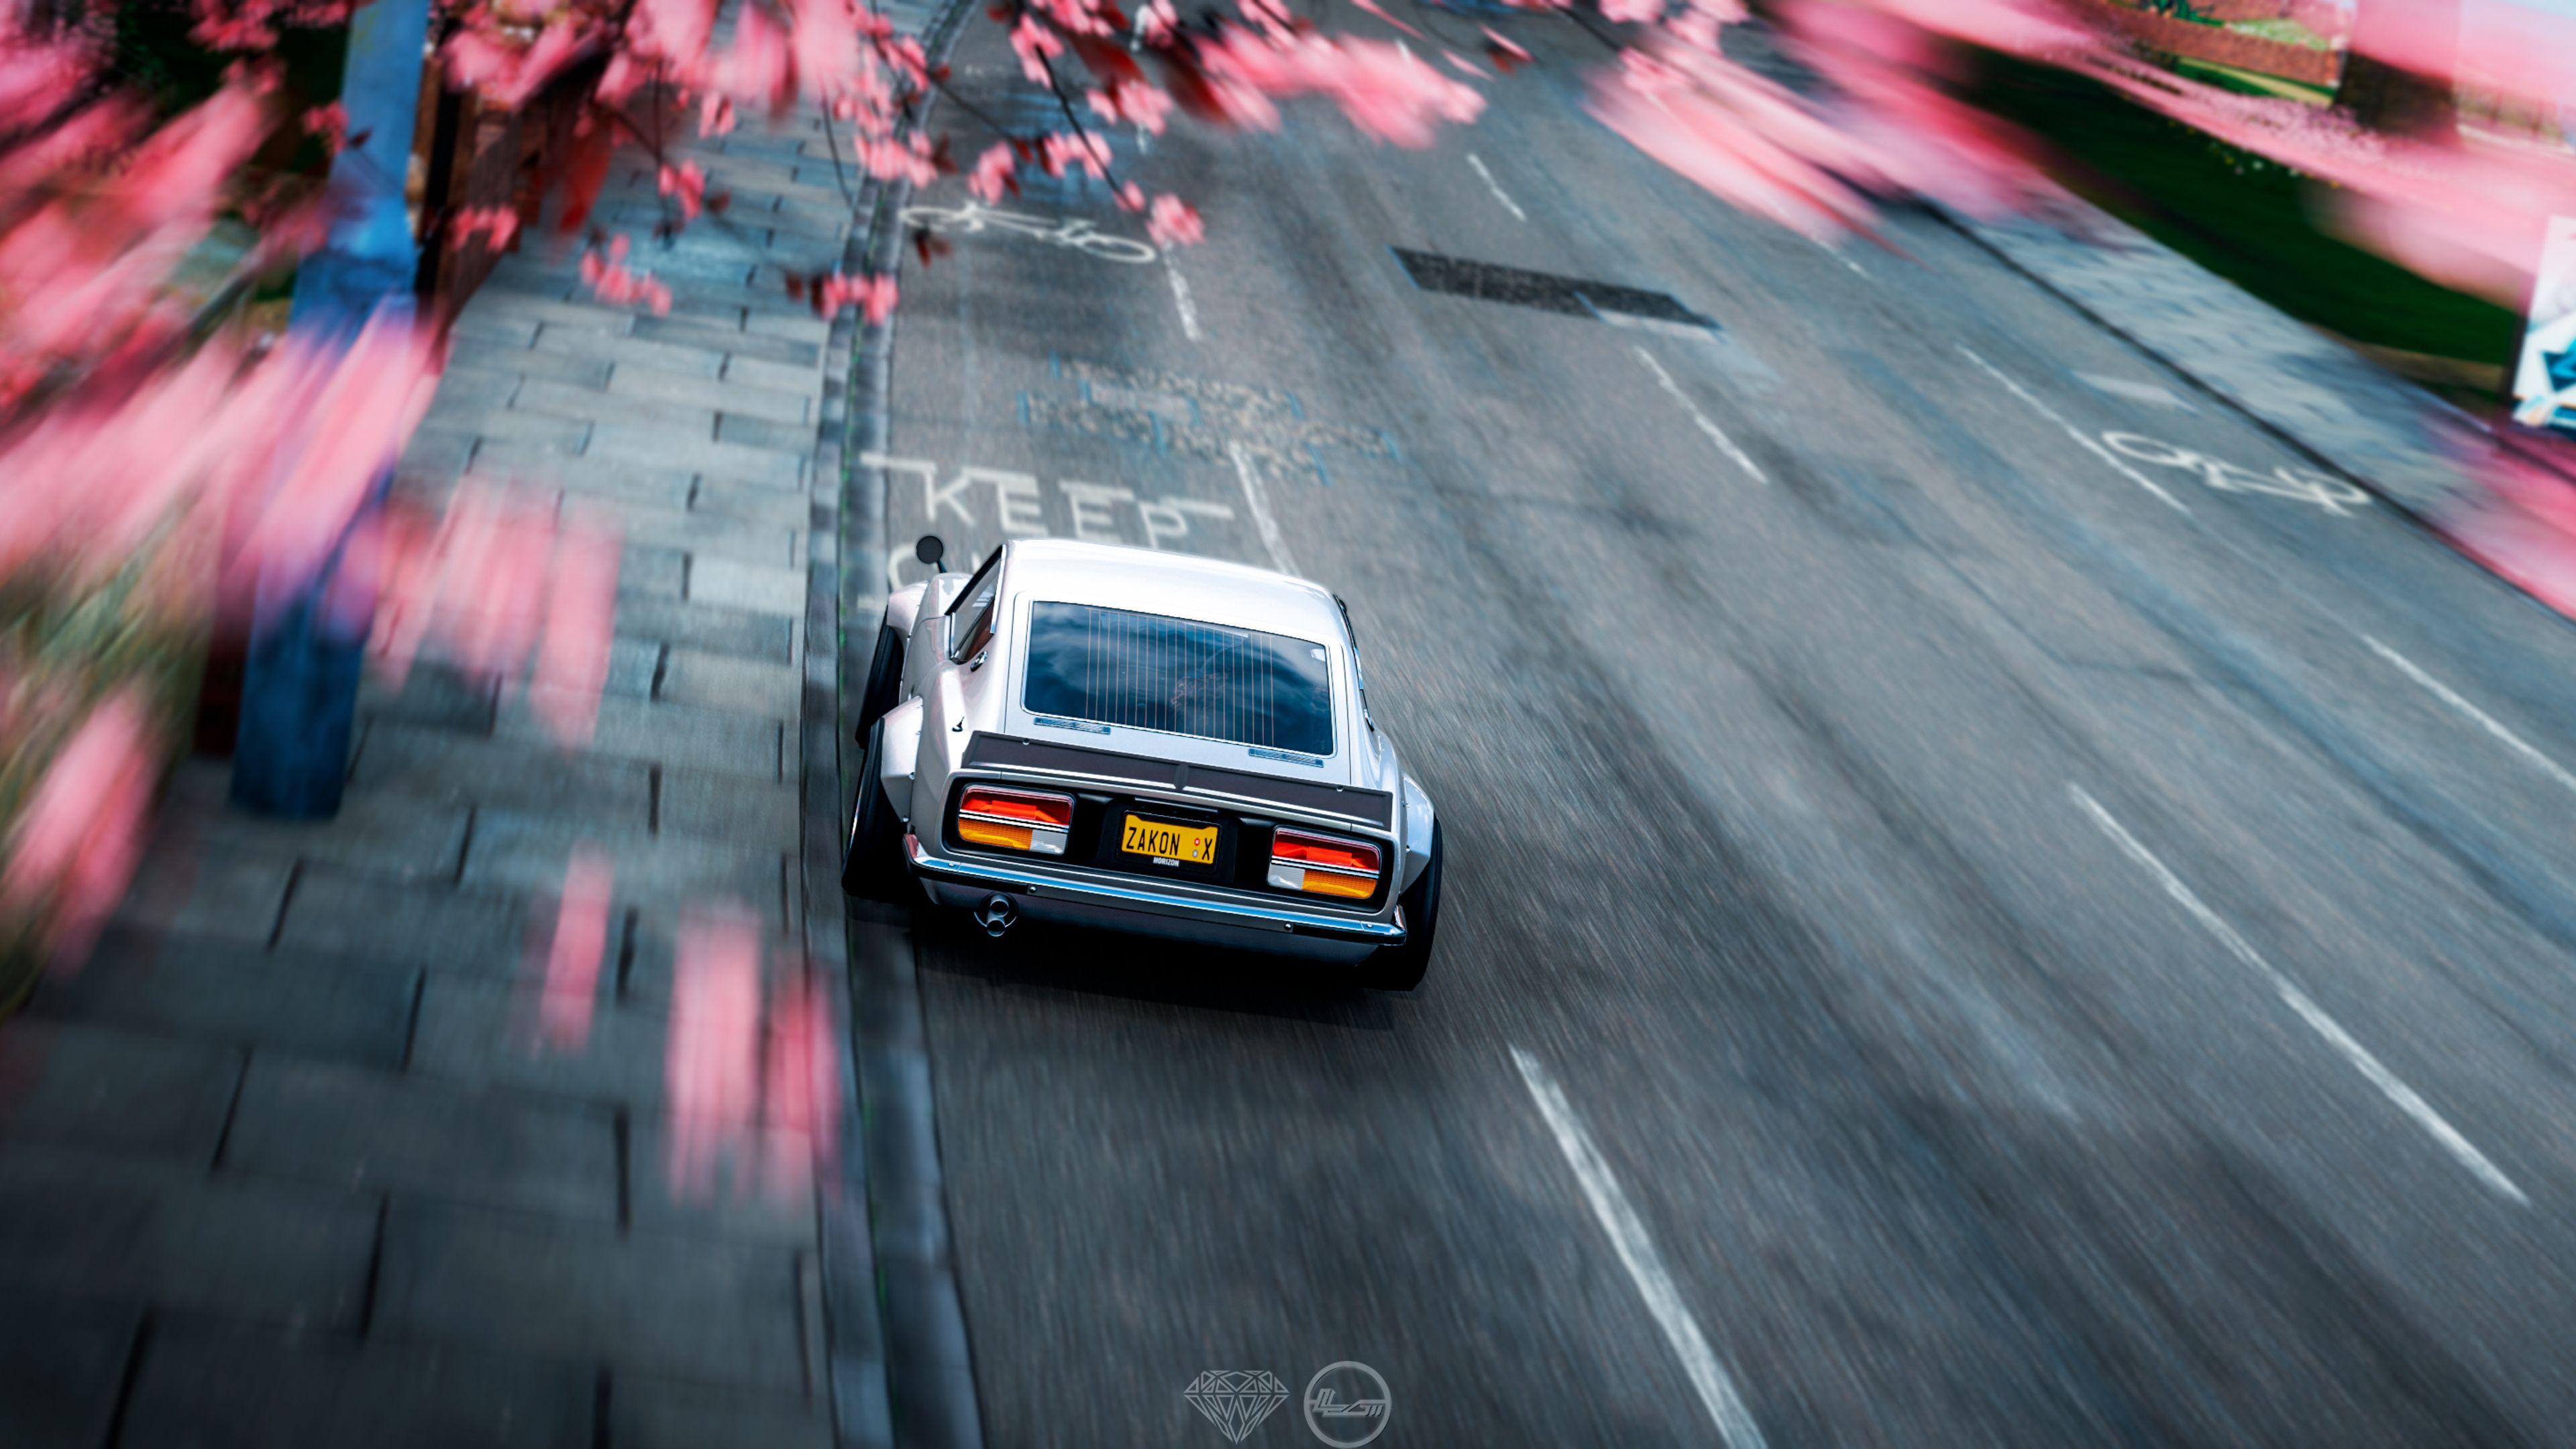 Download Wallpapers 4k Mclaren Senna Supercars Autosimulator 2018 Games Forza Horizon 4 Besthqwallpapers Com Forza Horizon Forza Horizon 4 Super Cars